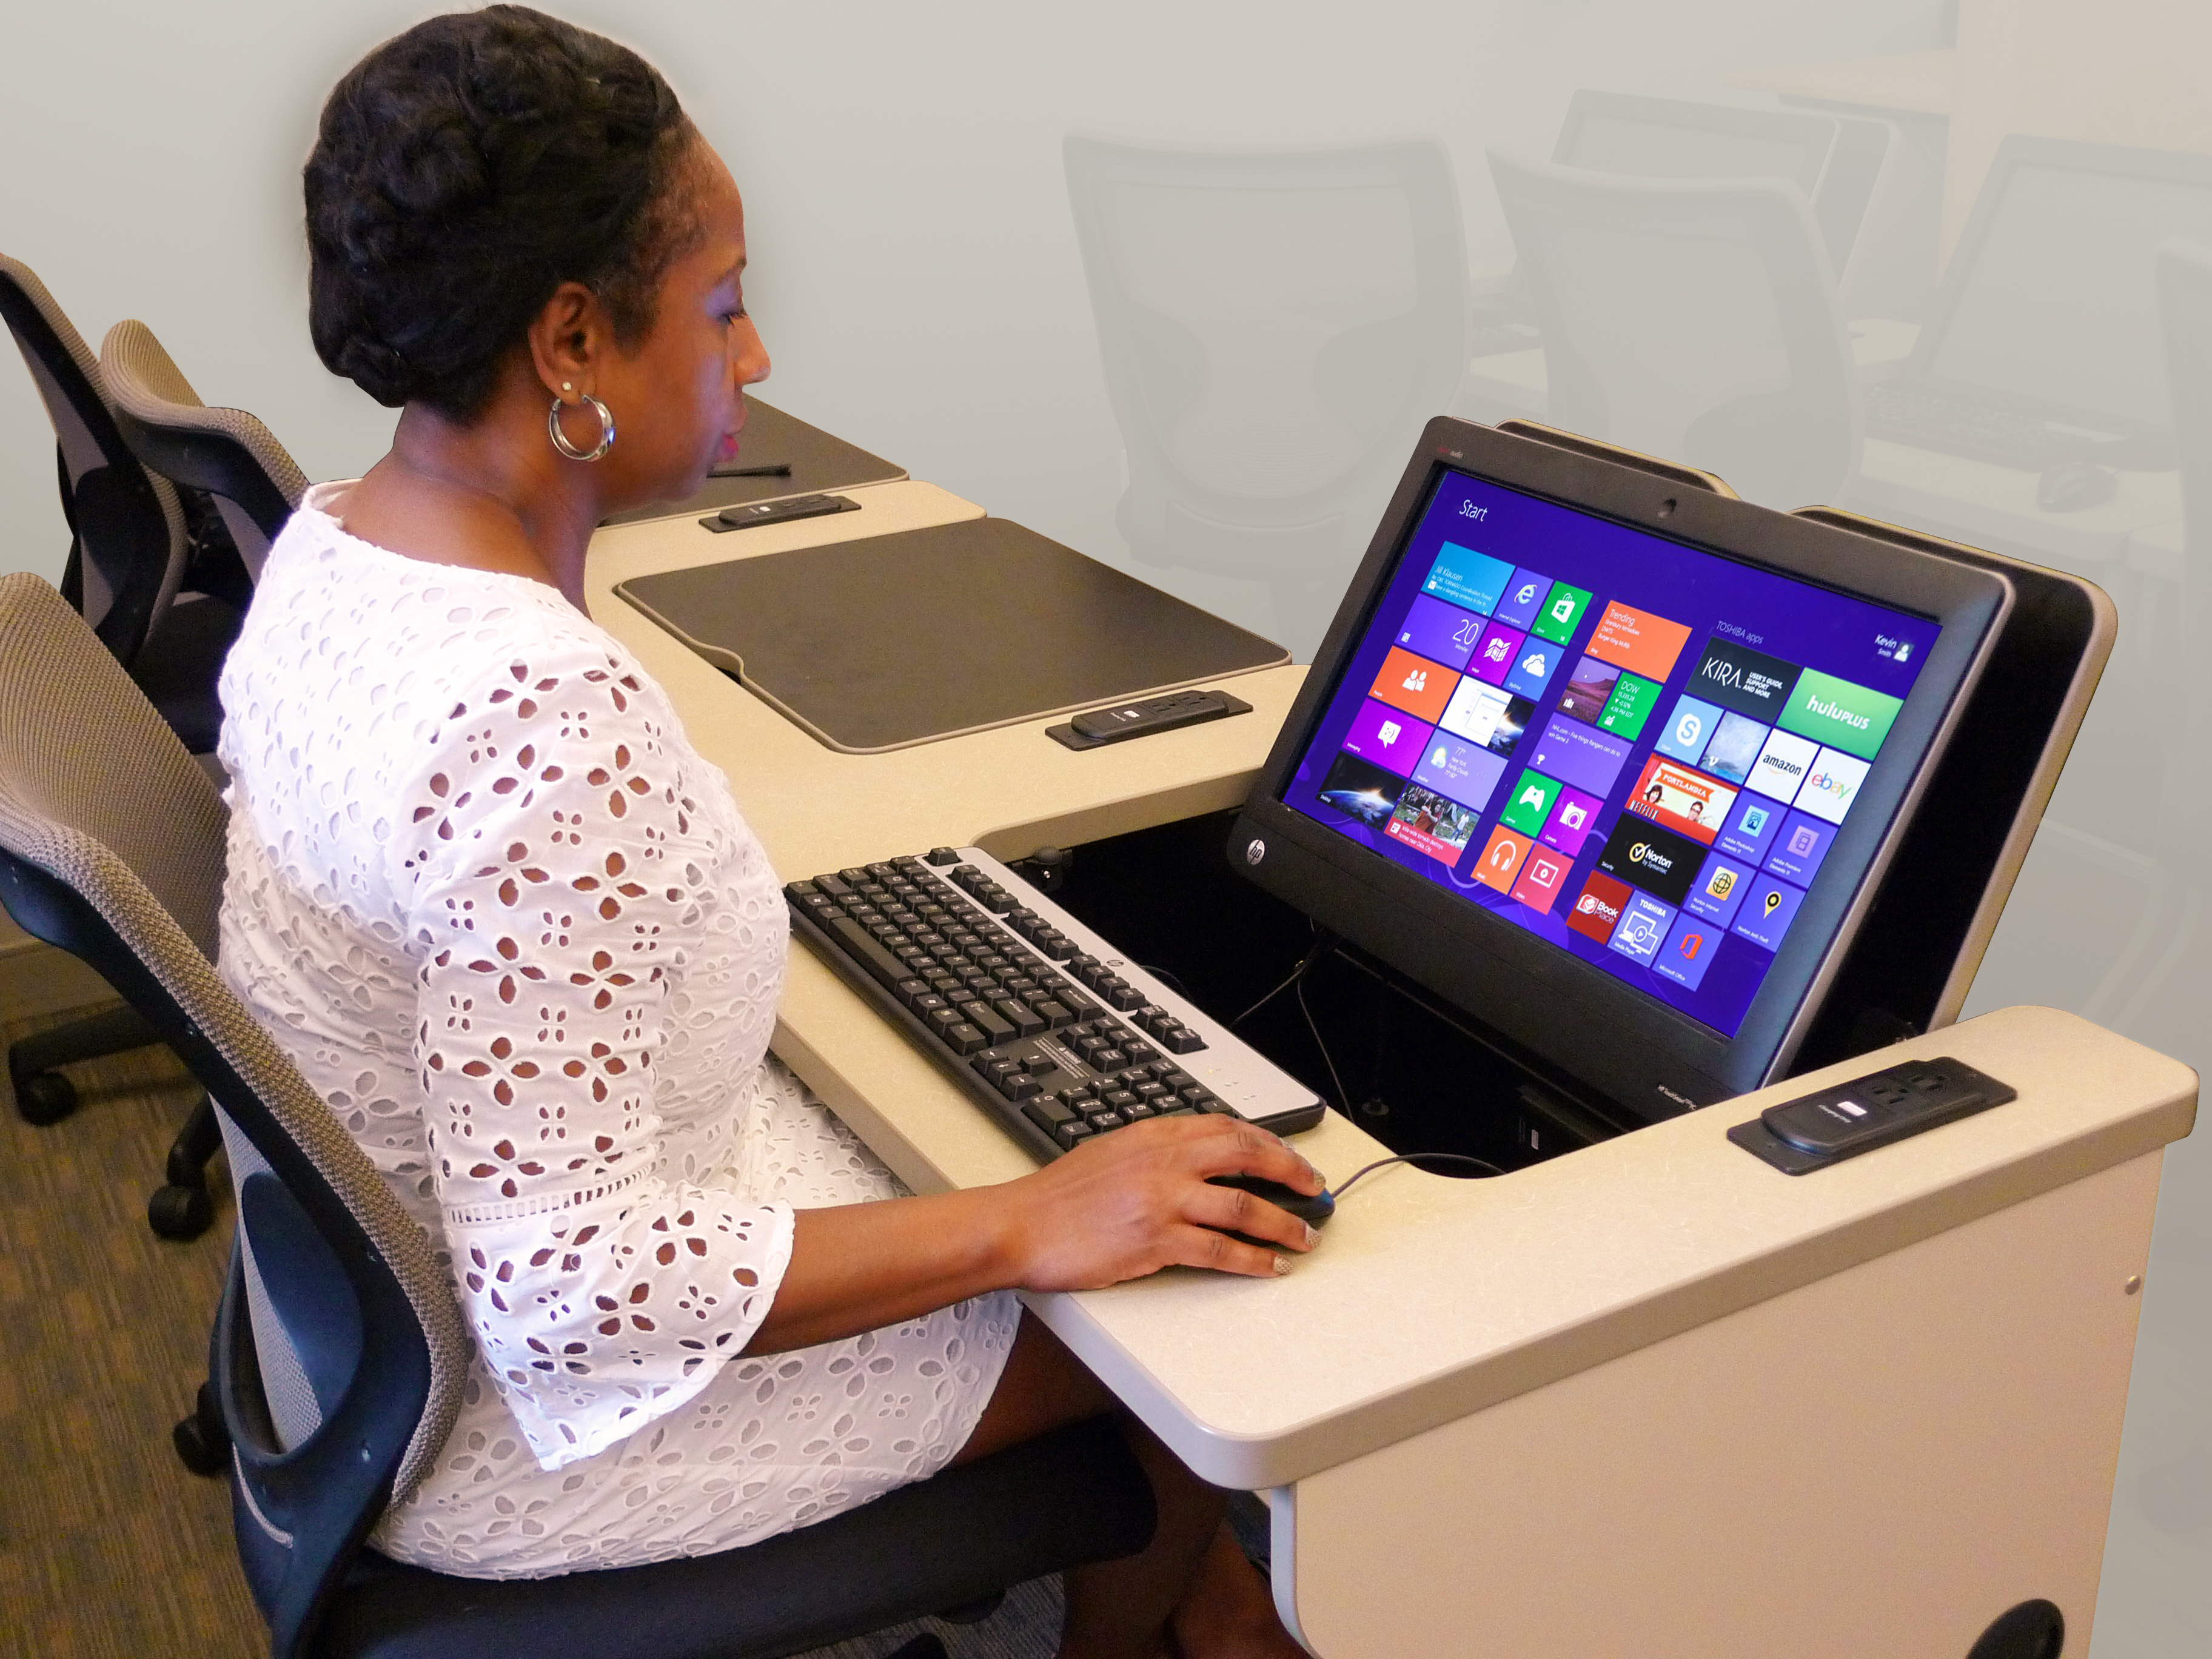 Multi Use Clroom At Peirce College Featuring Ilid Touch Smartdesksilid Smartdesks